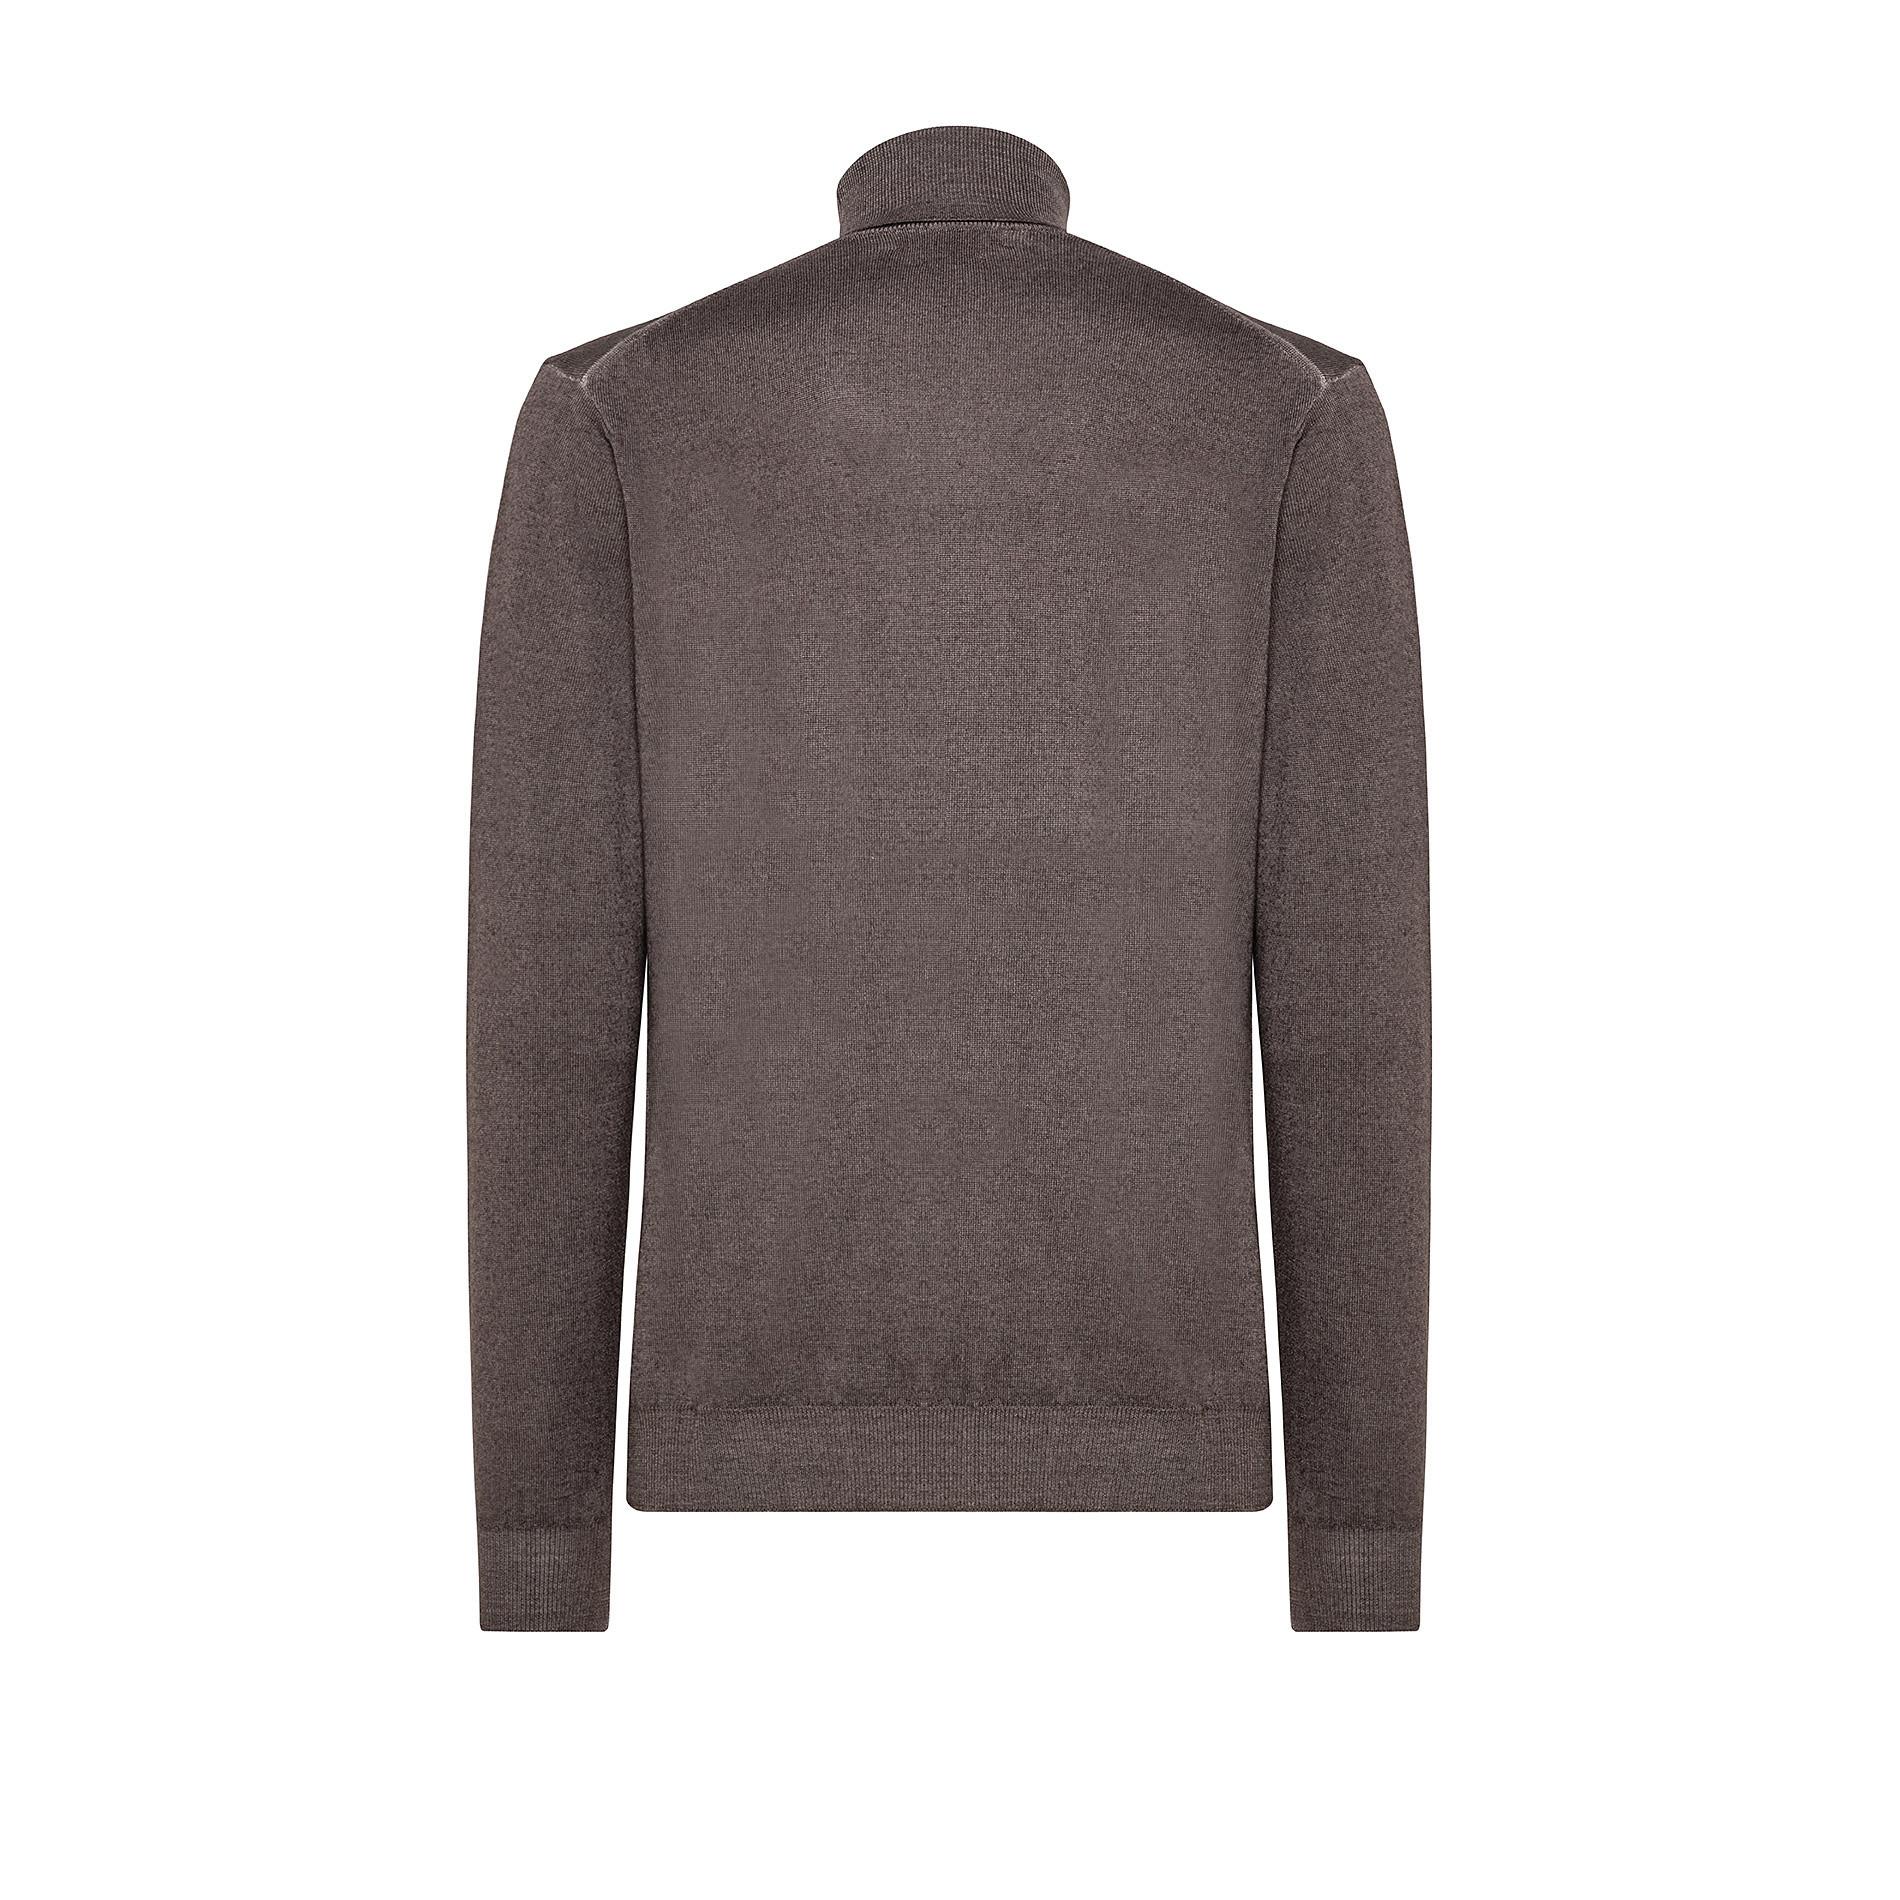 Pullover lana merinos collo alto, Marrone, large image number 1